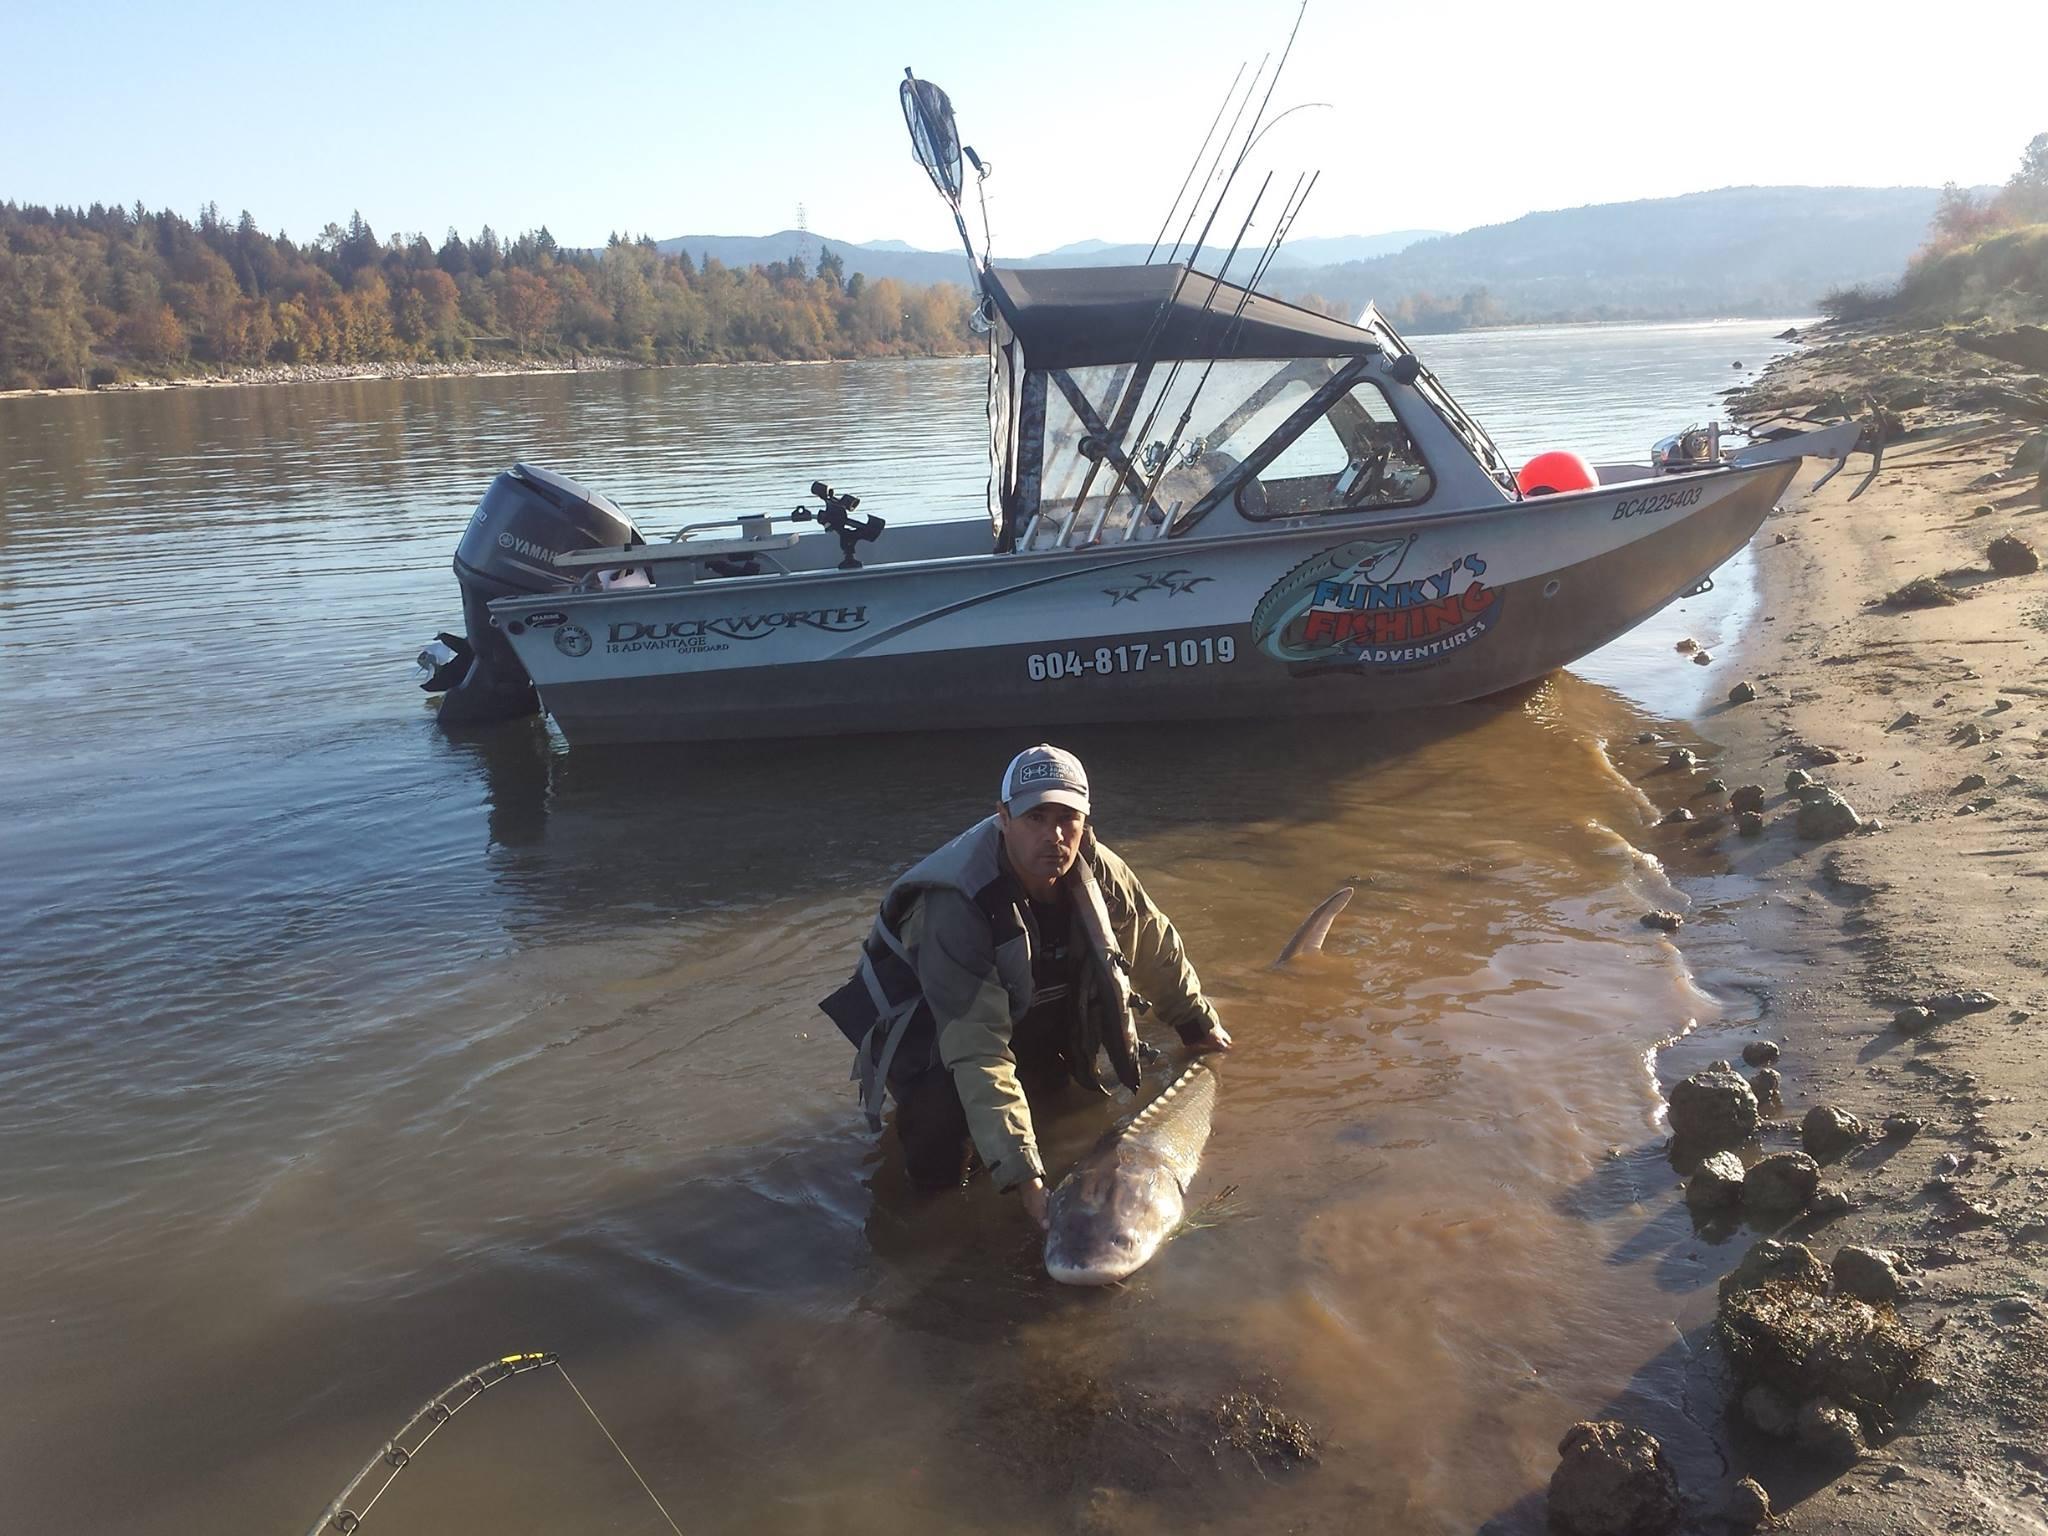 Rick Funk showing off a beautiful sturgeon fish he caught